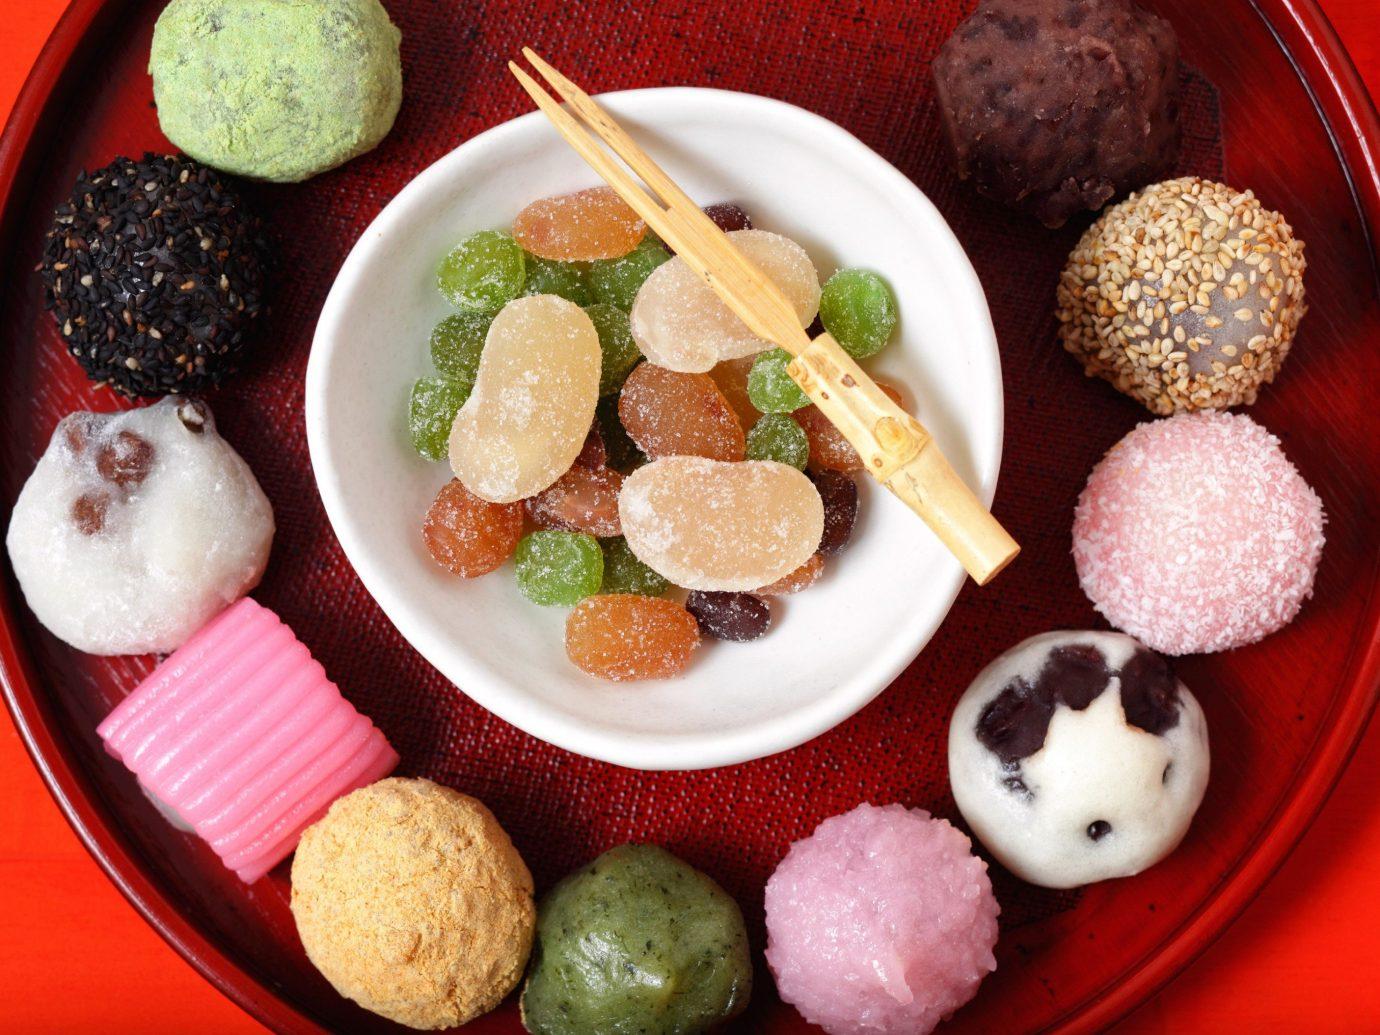 Food + Drink food plate dish cuisine meal asian food fruit falafel hors d oeuvre breakfast